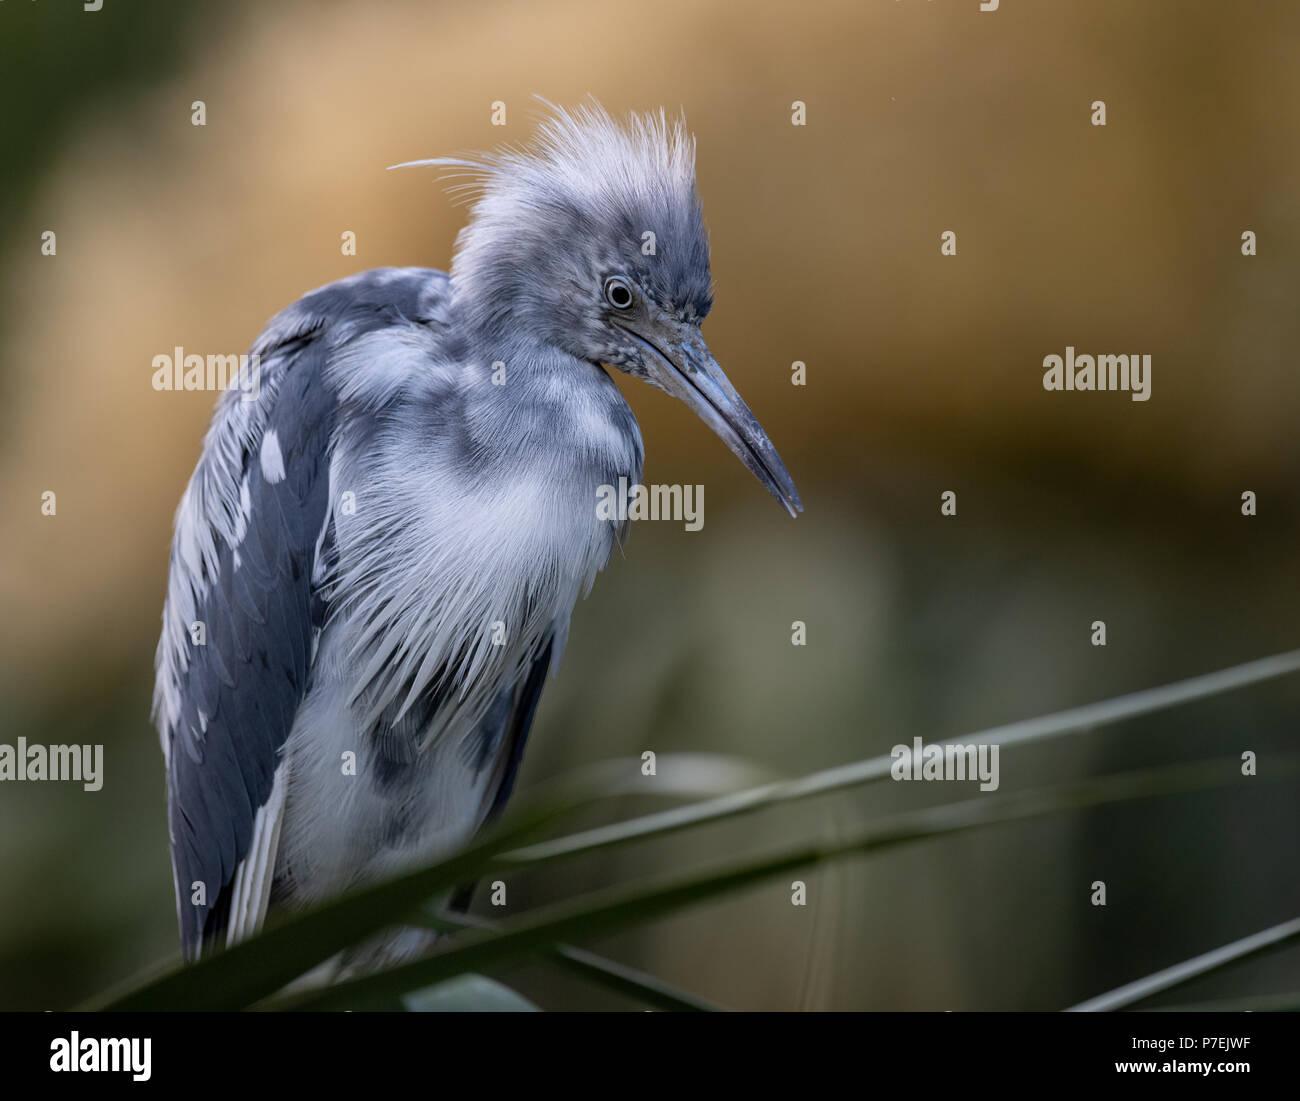 Little Blue Heron - Stock Image